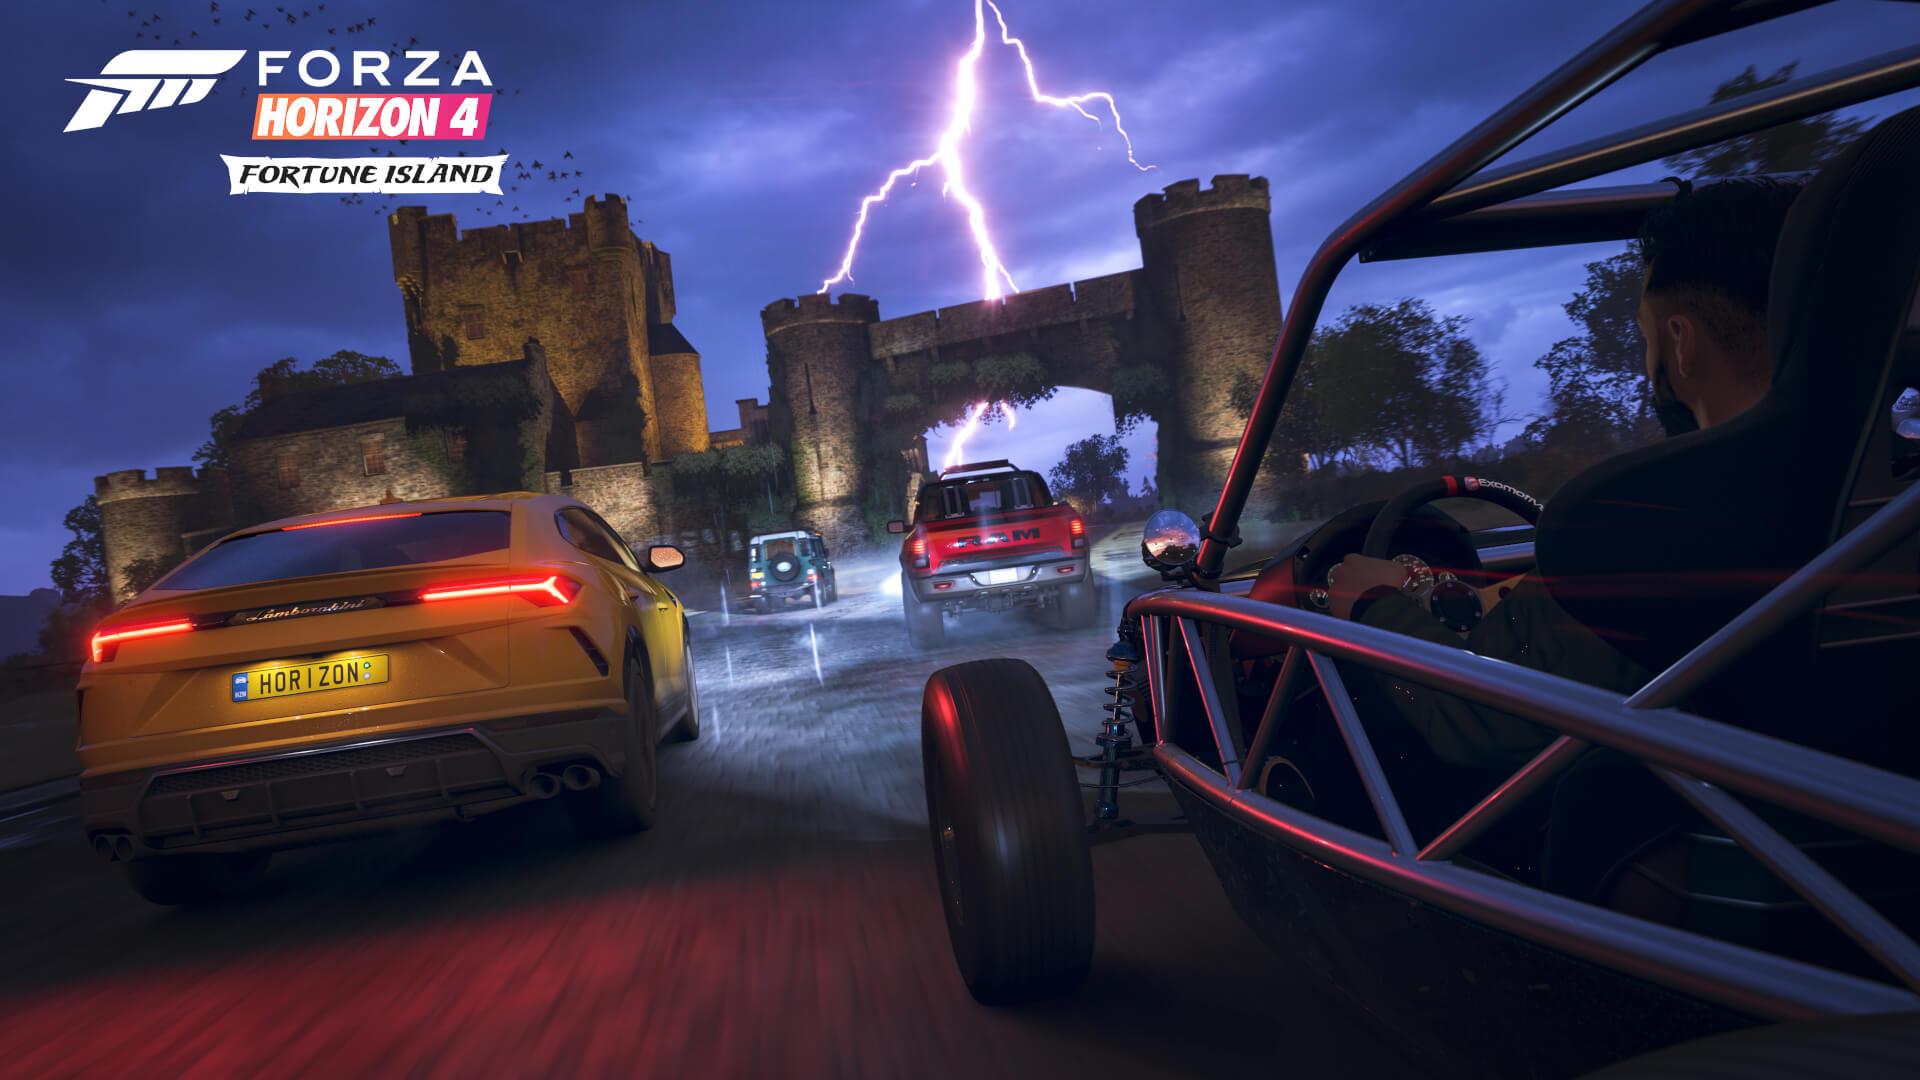 Forza Horizon 4 Fortune Island Achievements List